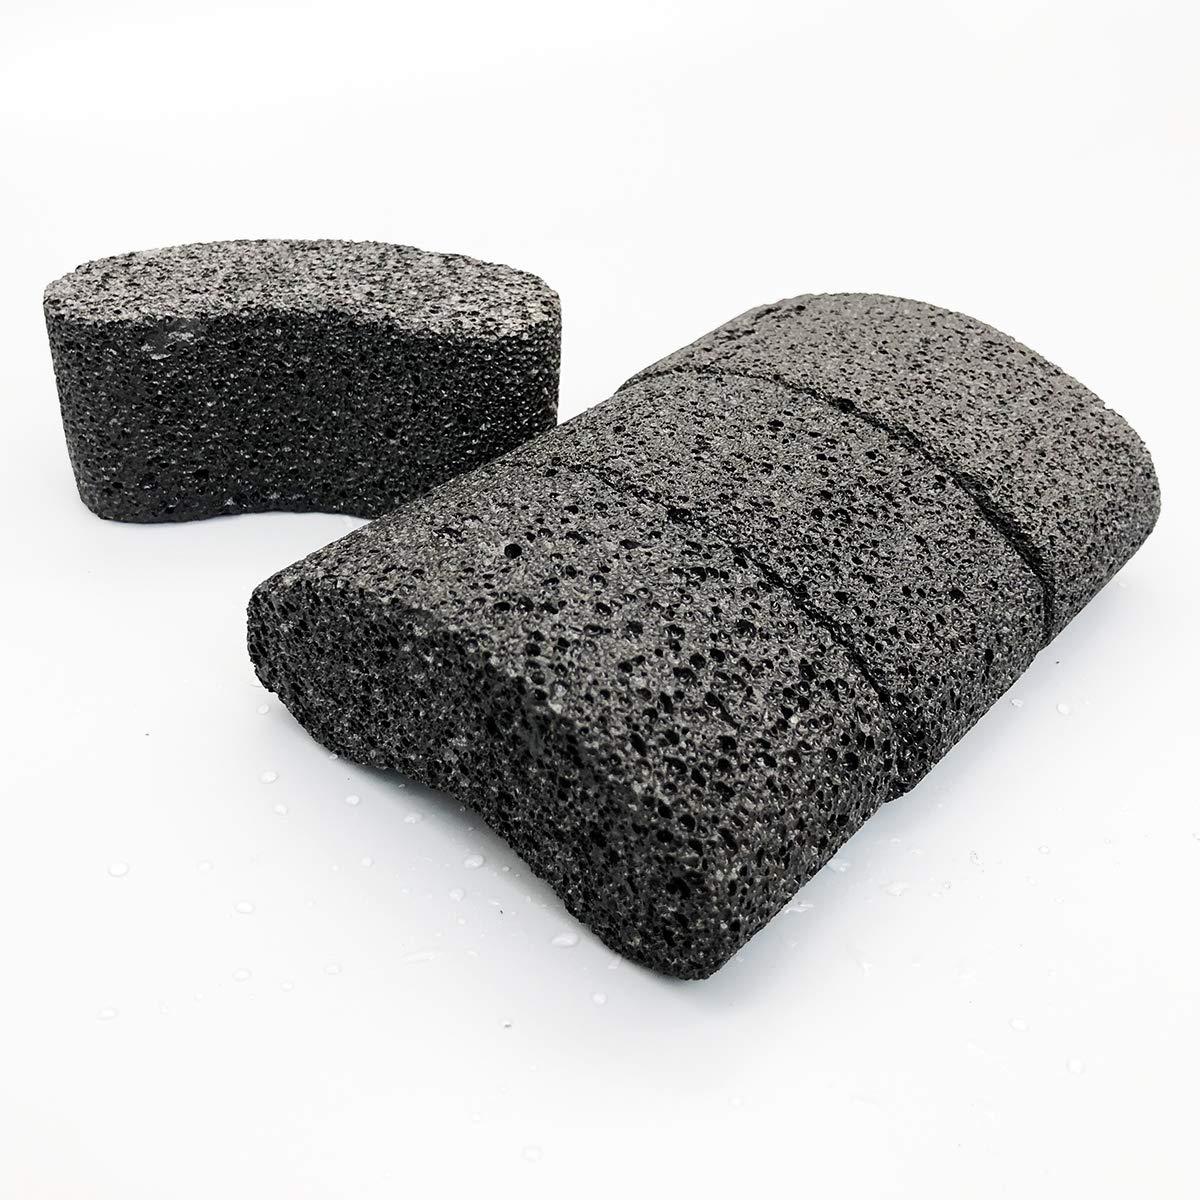 Bicrops Natural Lava Pumice Stone De Pedicure service Tool Callus Hard List price